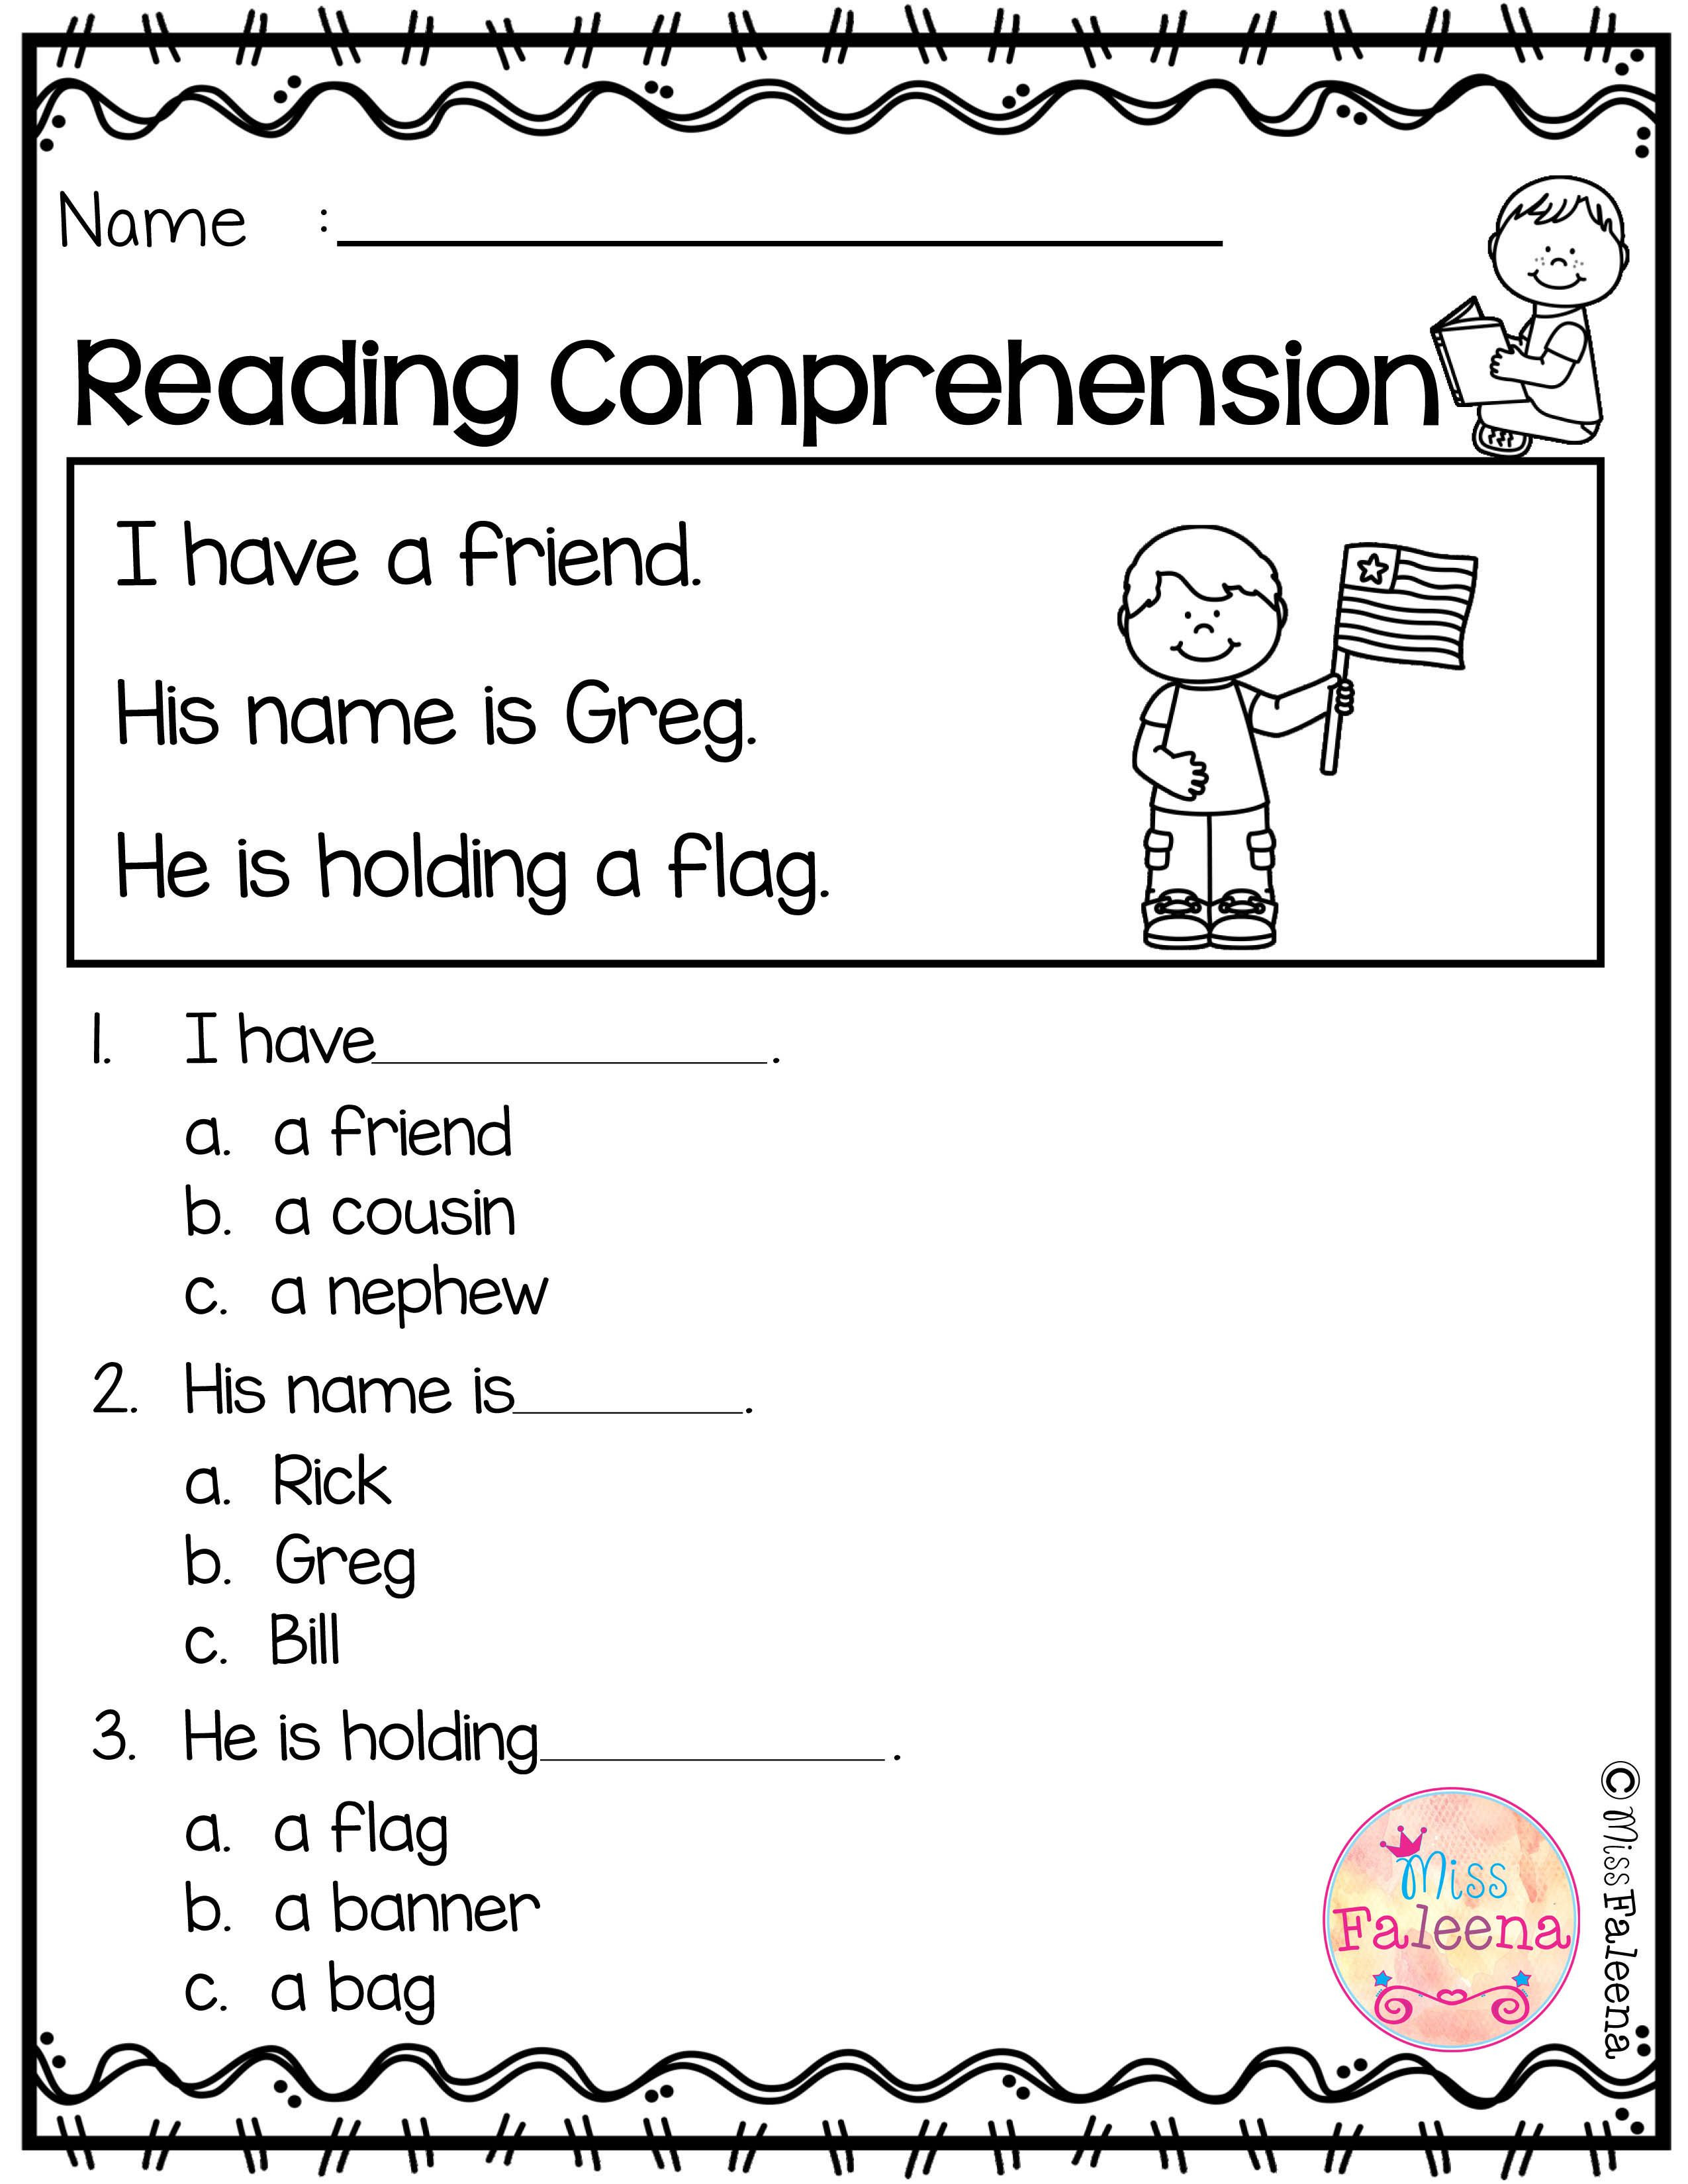 Kindergarten Reading Comprehension Worksheets Free Reading Prehension with Images